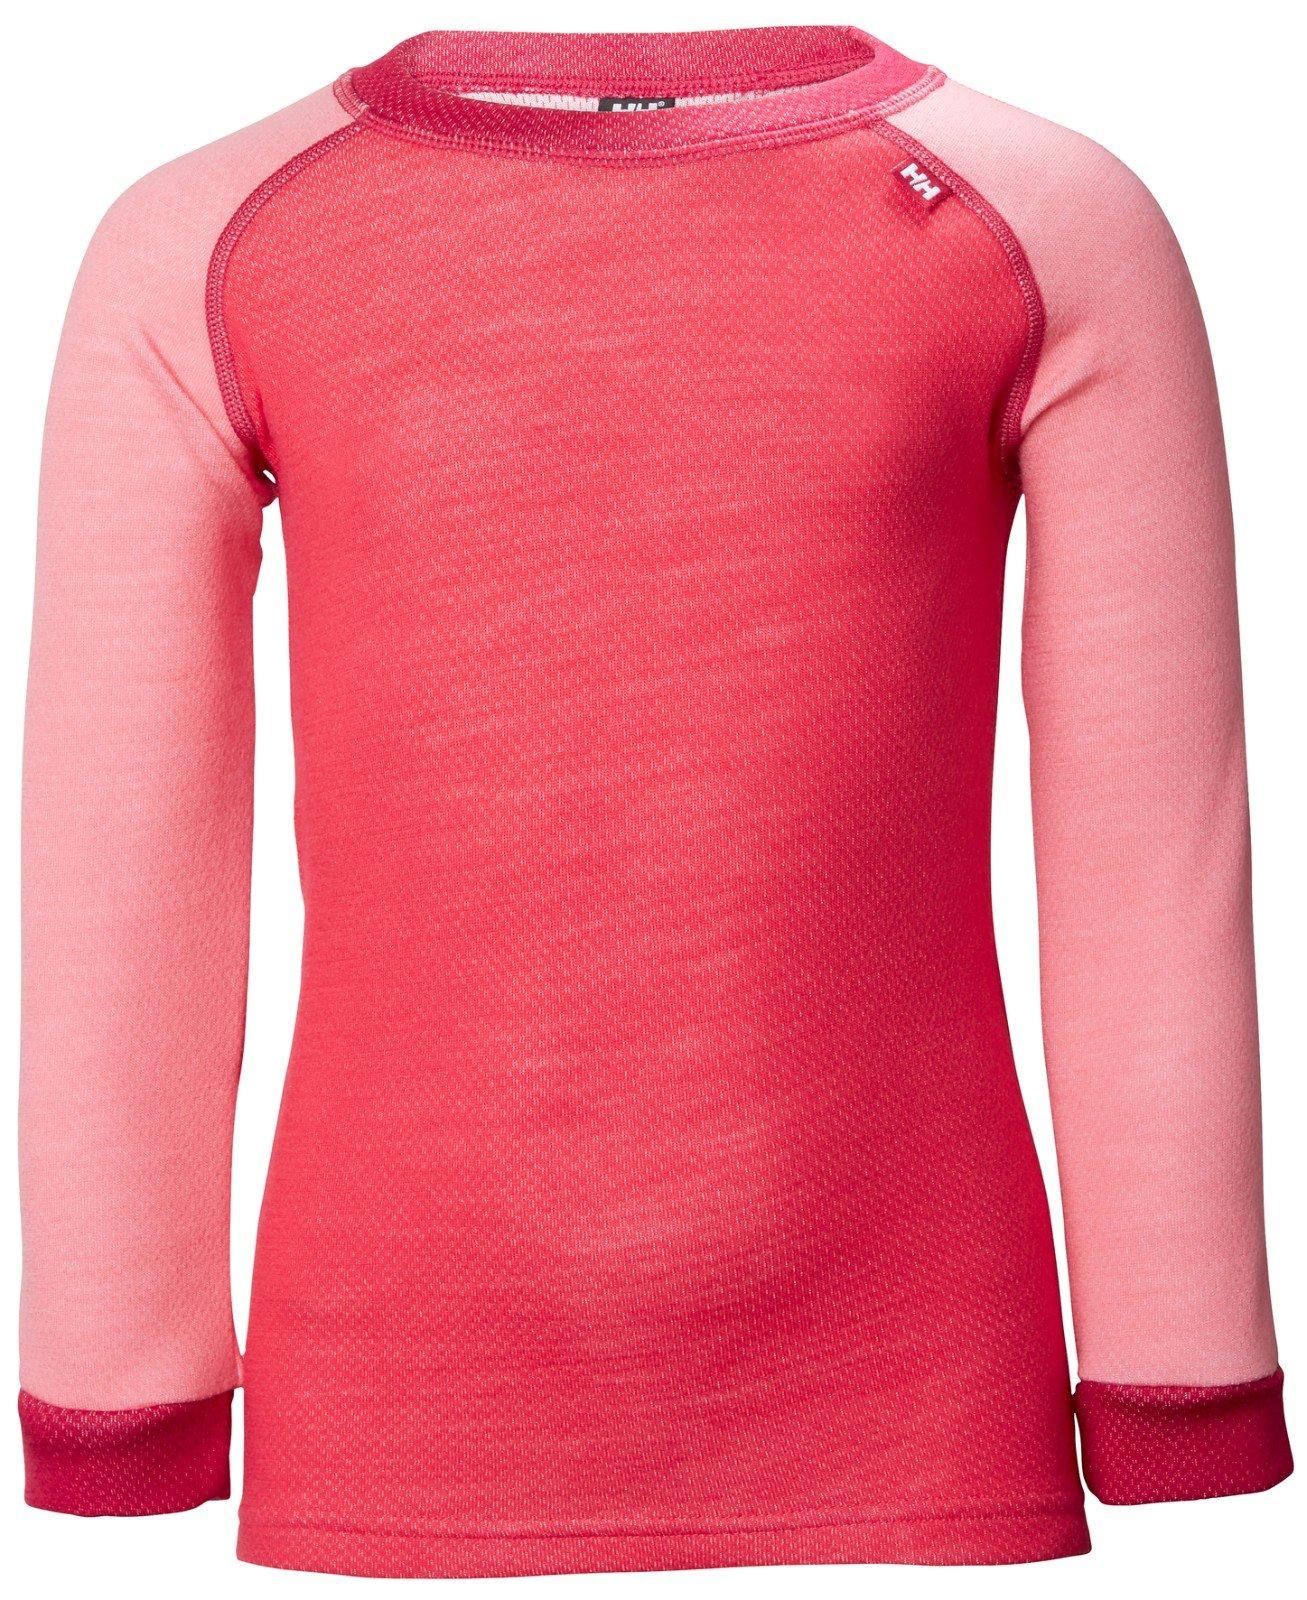 Helly Hansen Kids LIFA Merino Wool Warm Baselayer Set Top and Bottom, 167 Strawberry Pink, Size 3